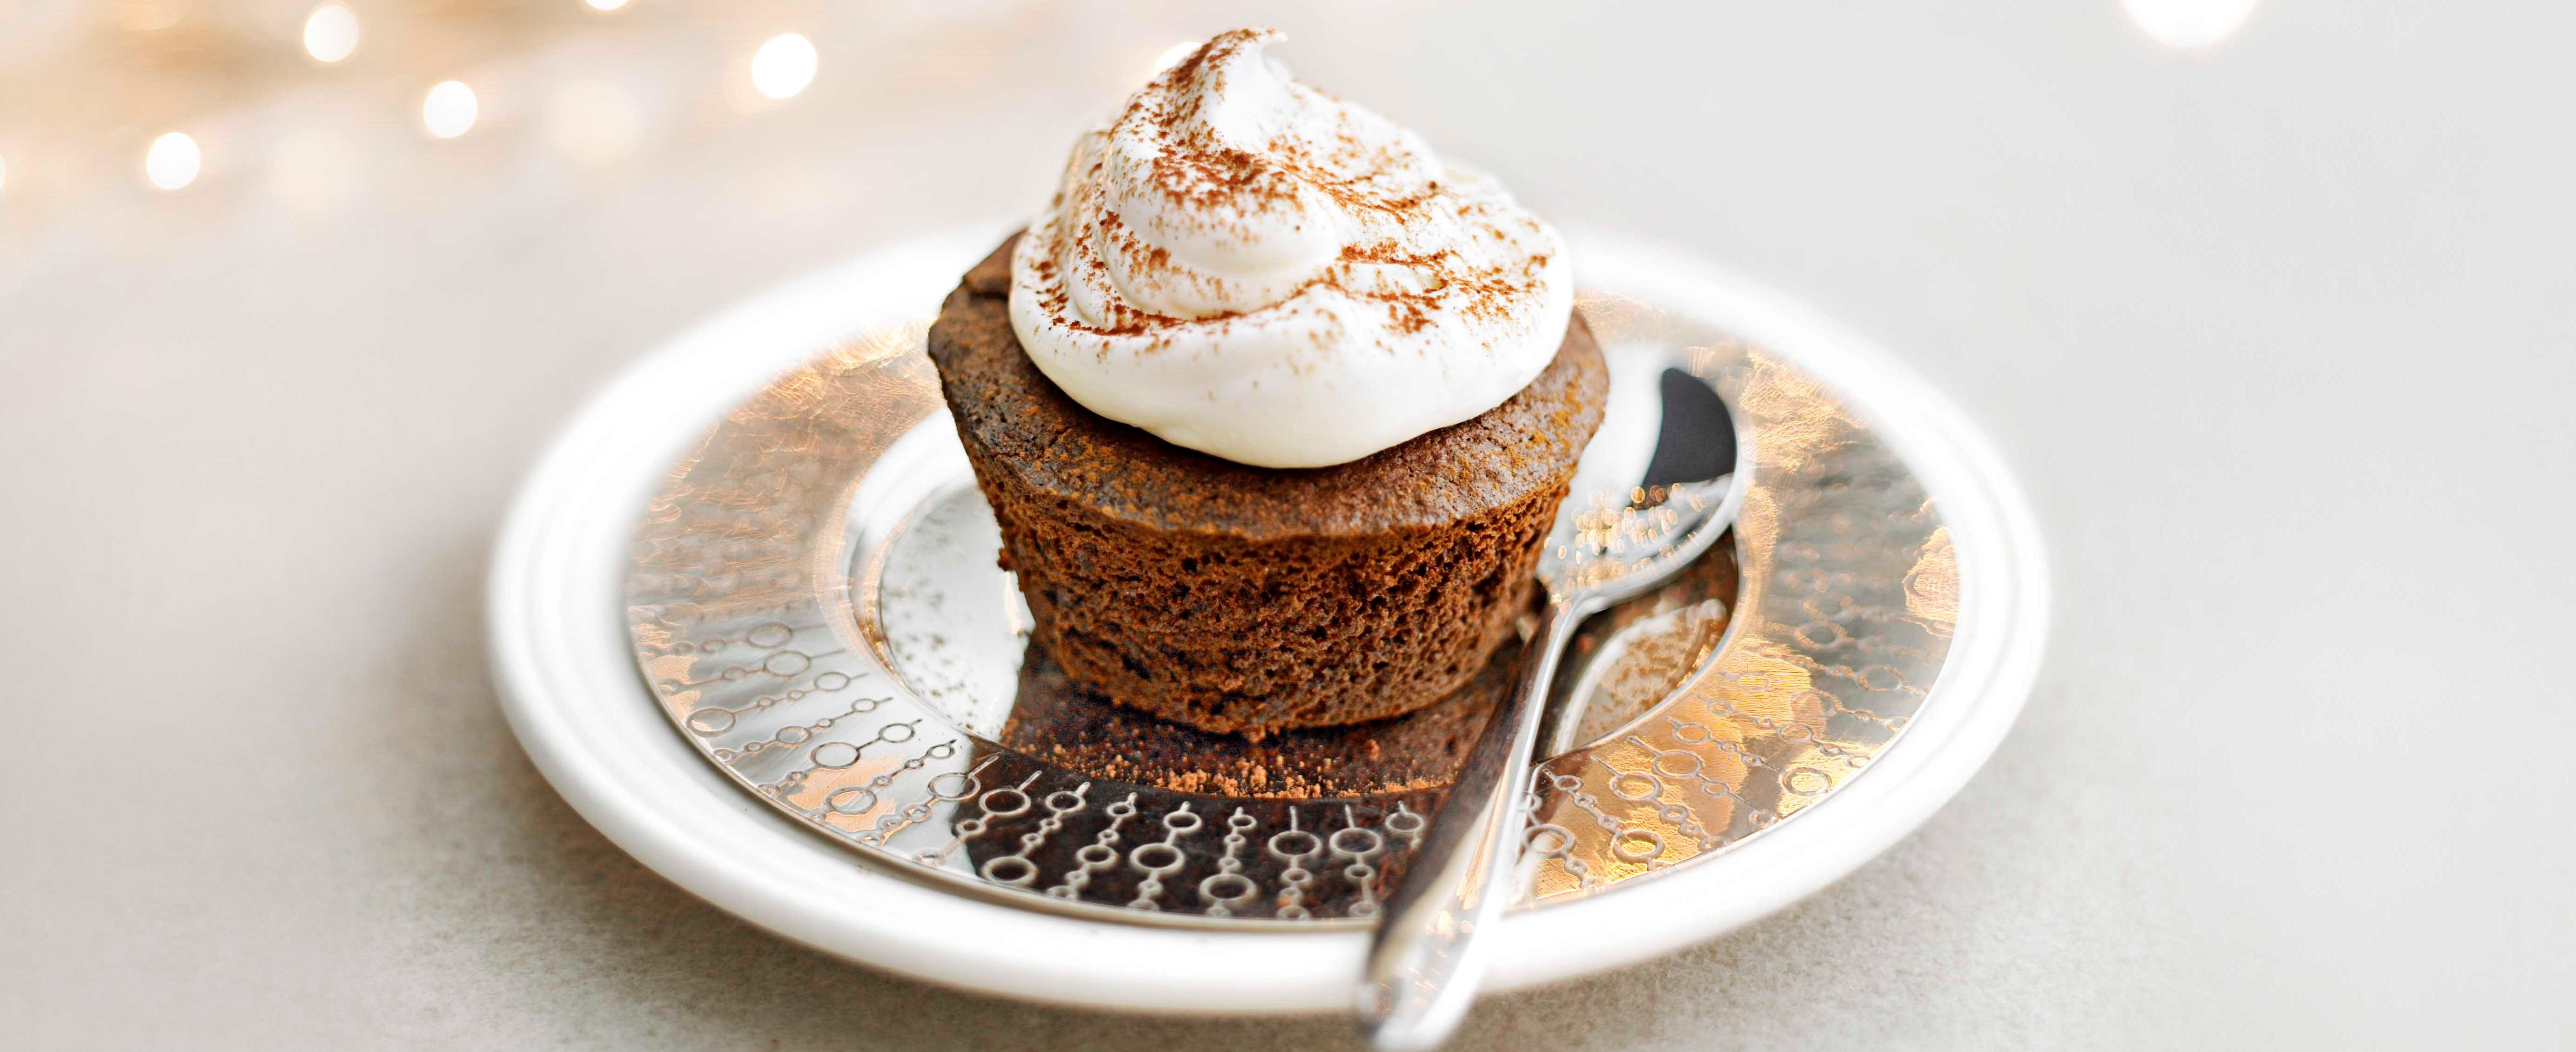 Chocolate Brownies Recipe with Meringue